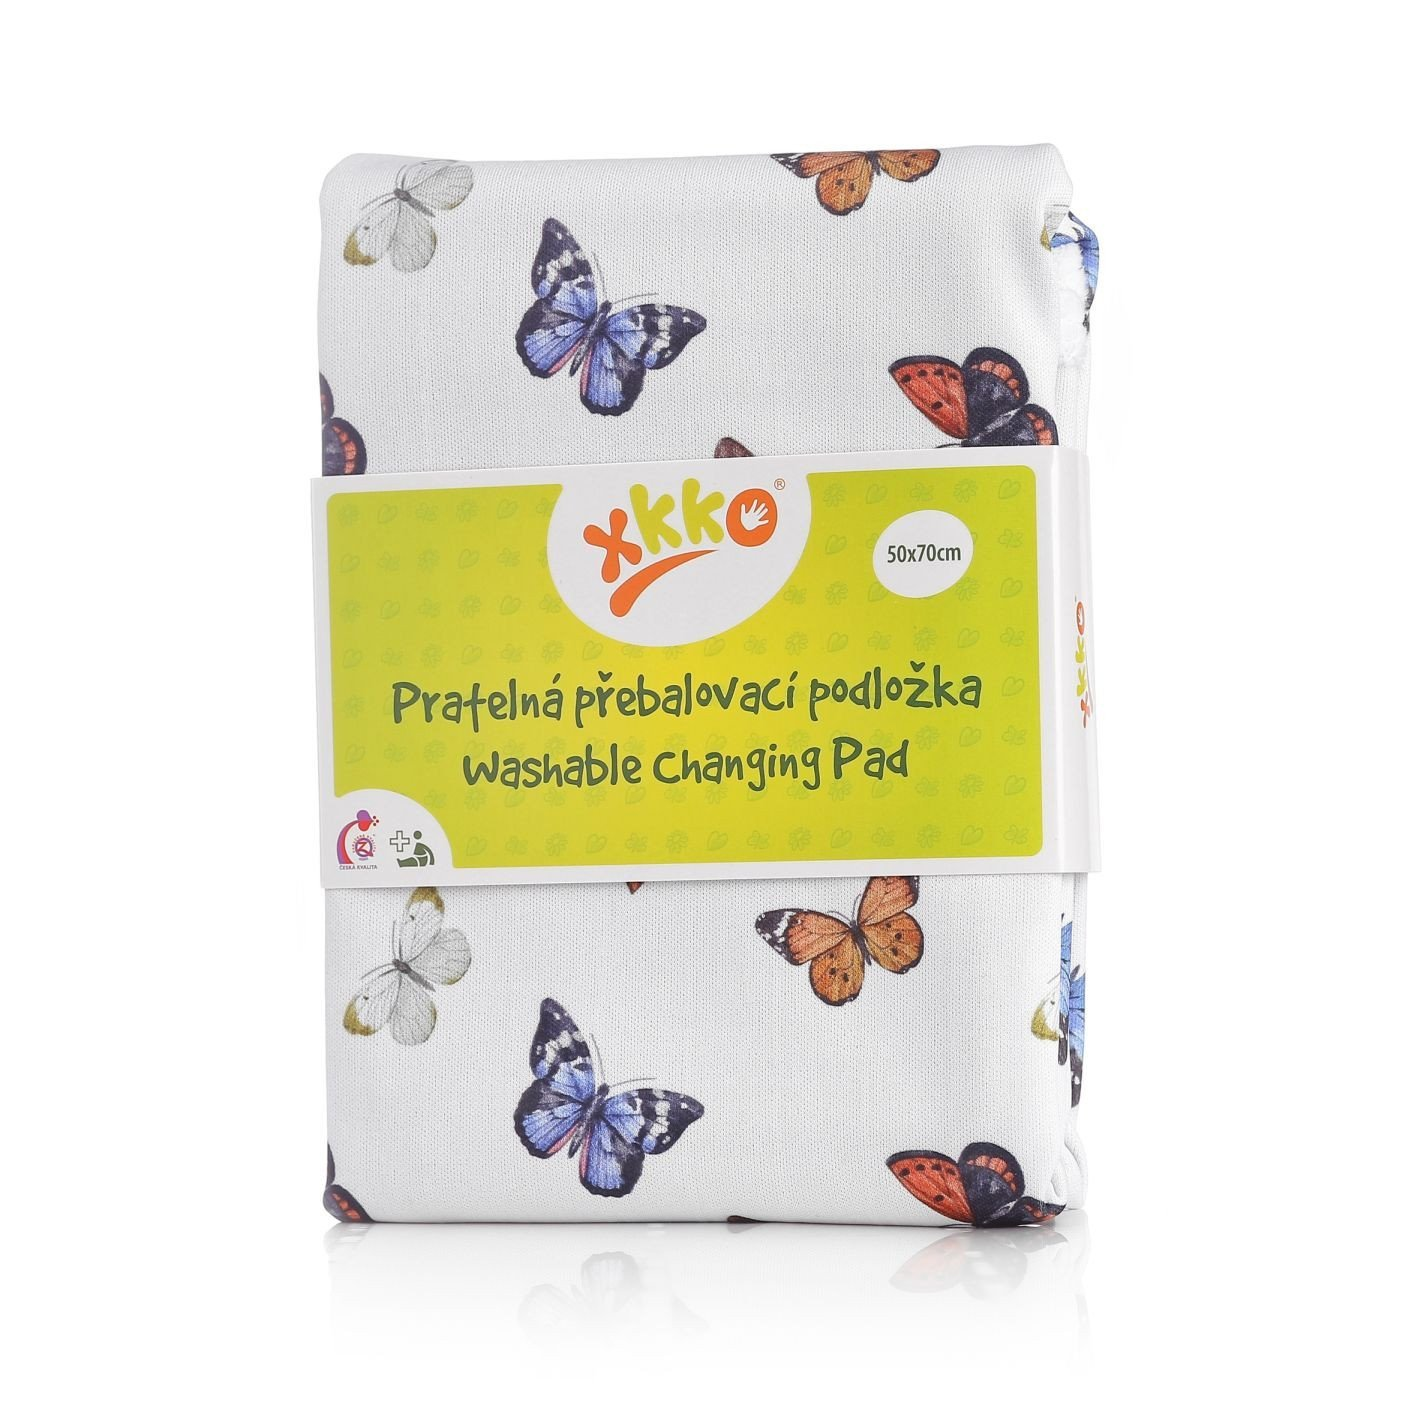 Prateln� p�ebalovac� podlo�ka 50x70 cm Digi Butterflies - zv��i� obr�zok